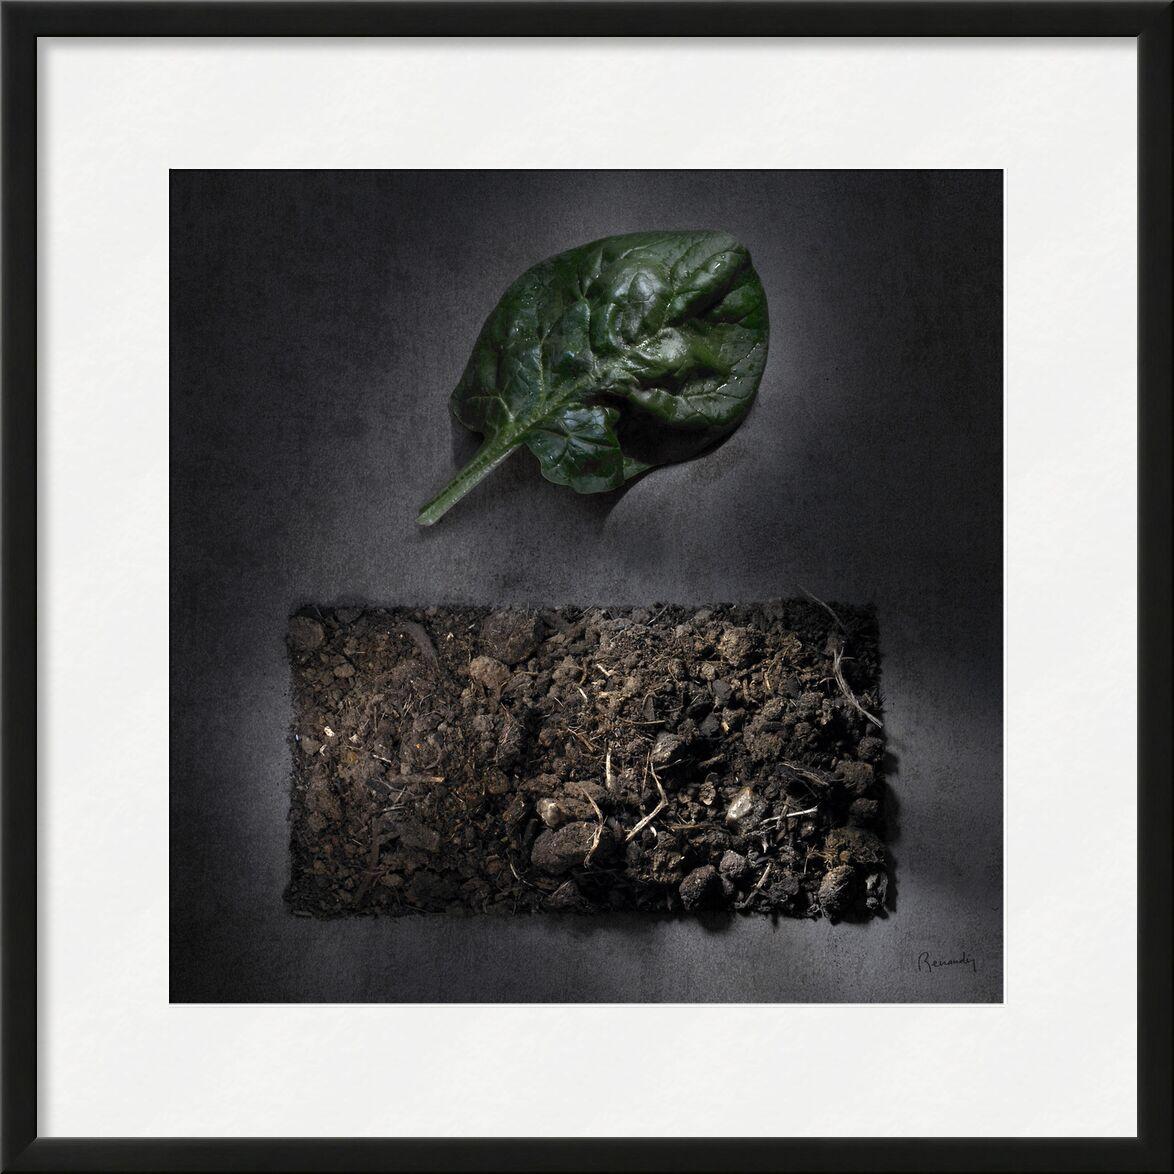 Goal LAND!  #5 from jean michel RENAUDIN, Prodi Art, arable land, processing, lands, humus, transformation, fruits, compost, topsoil, Sun, vegetables